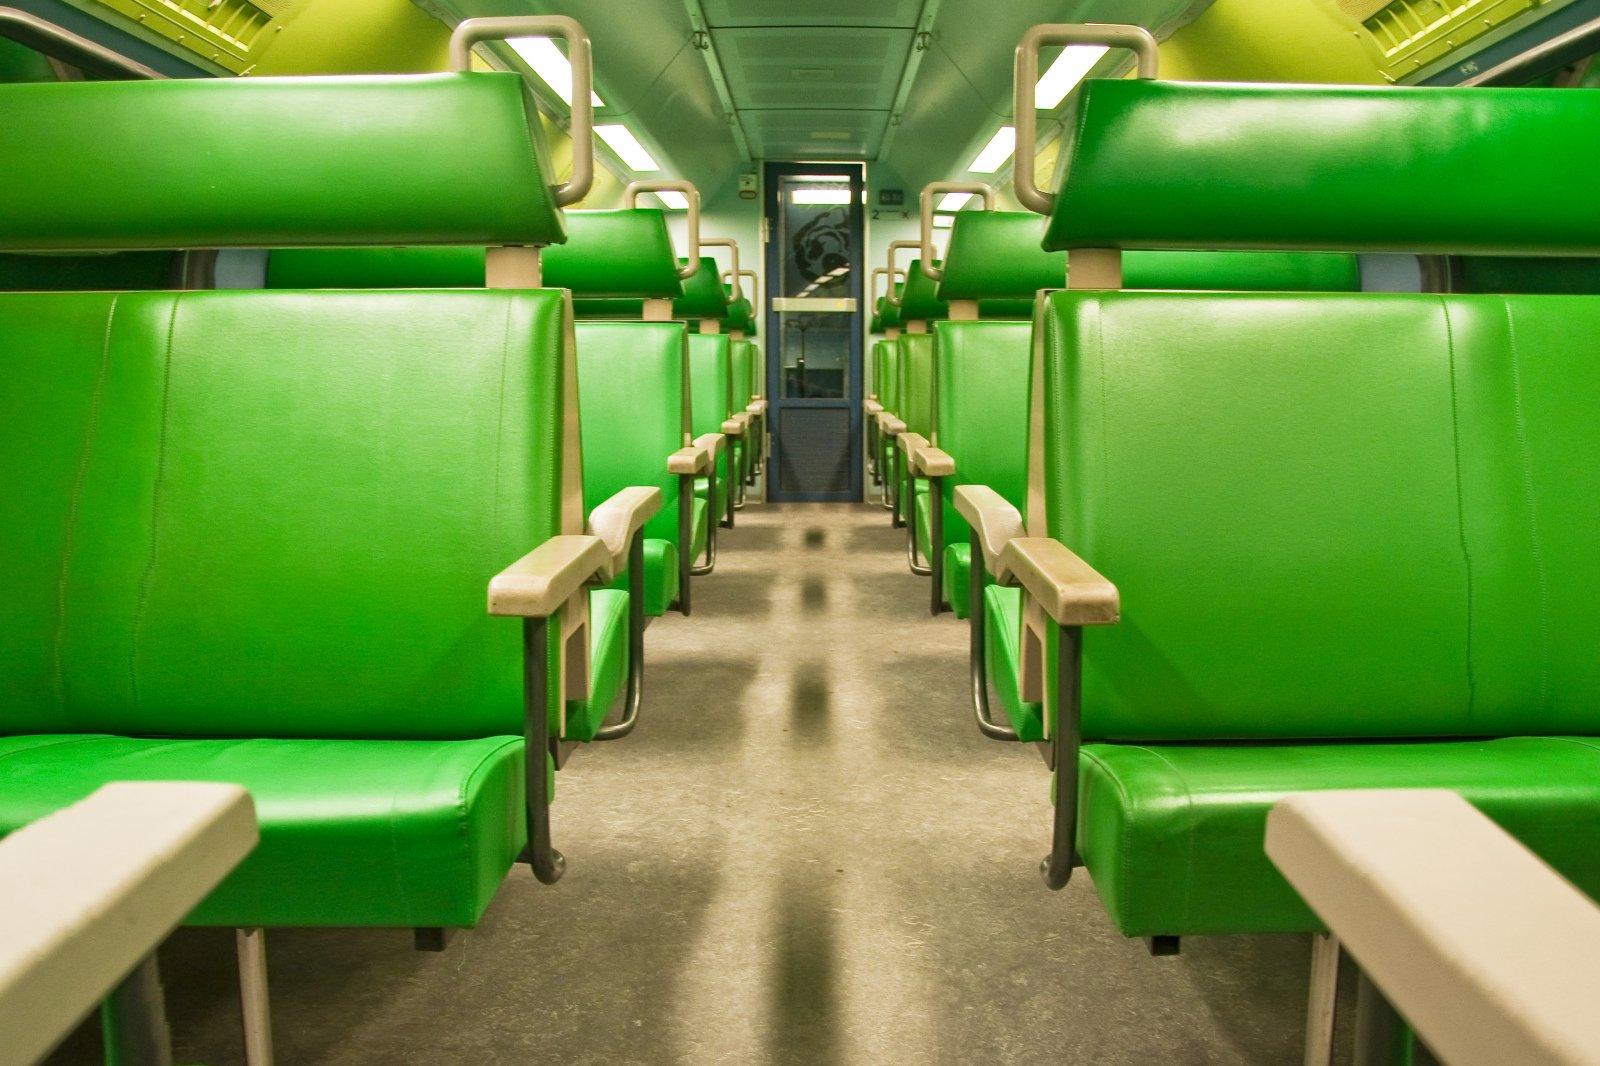 Last train to Amsterdam